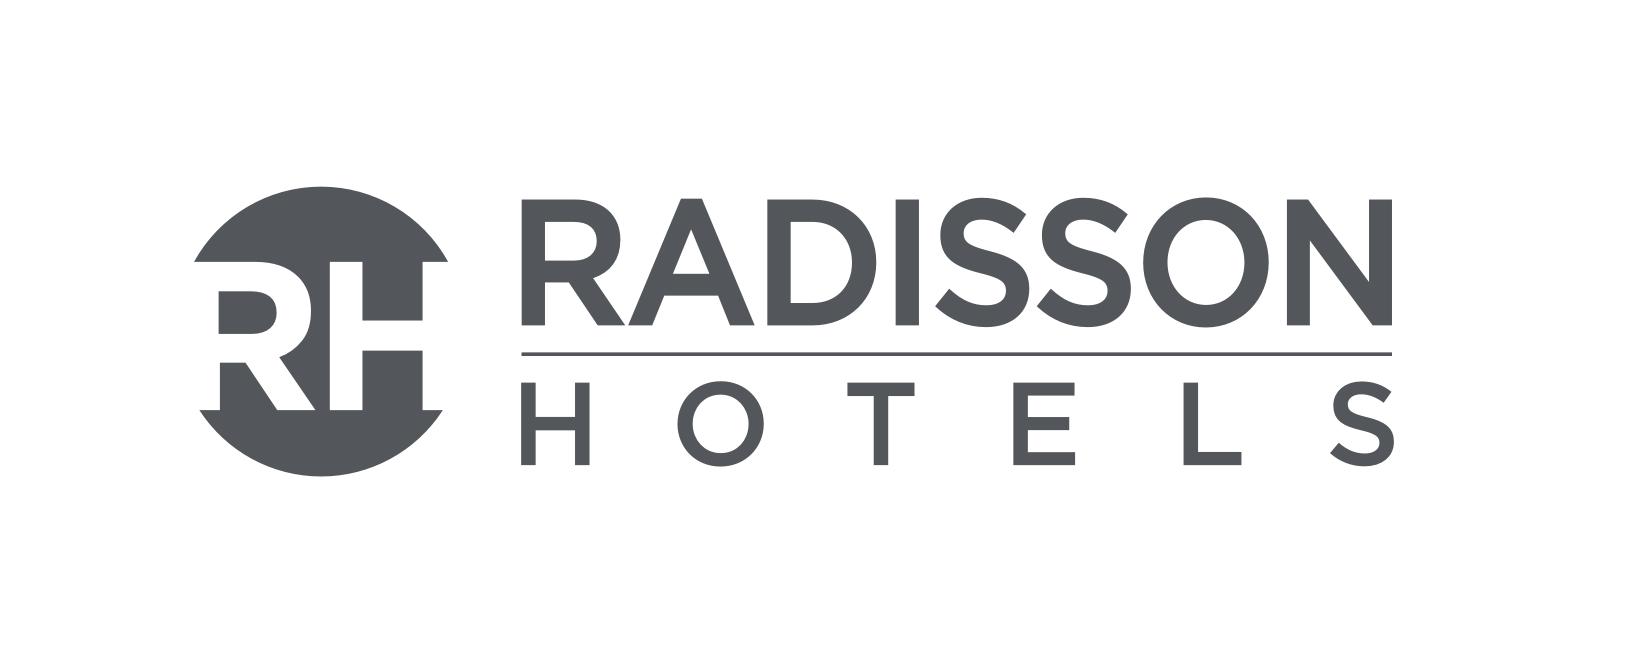 Radisson Hotels UK Discount Code 2021